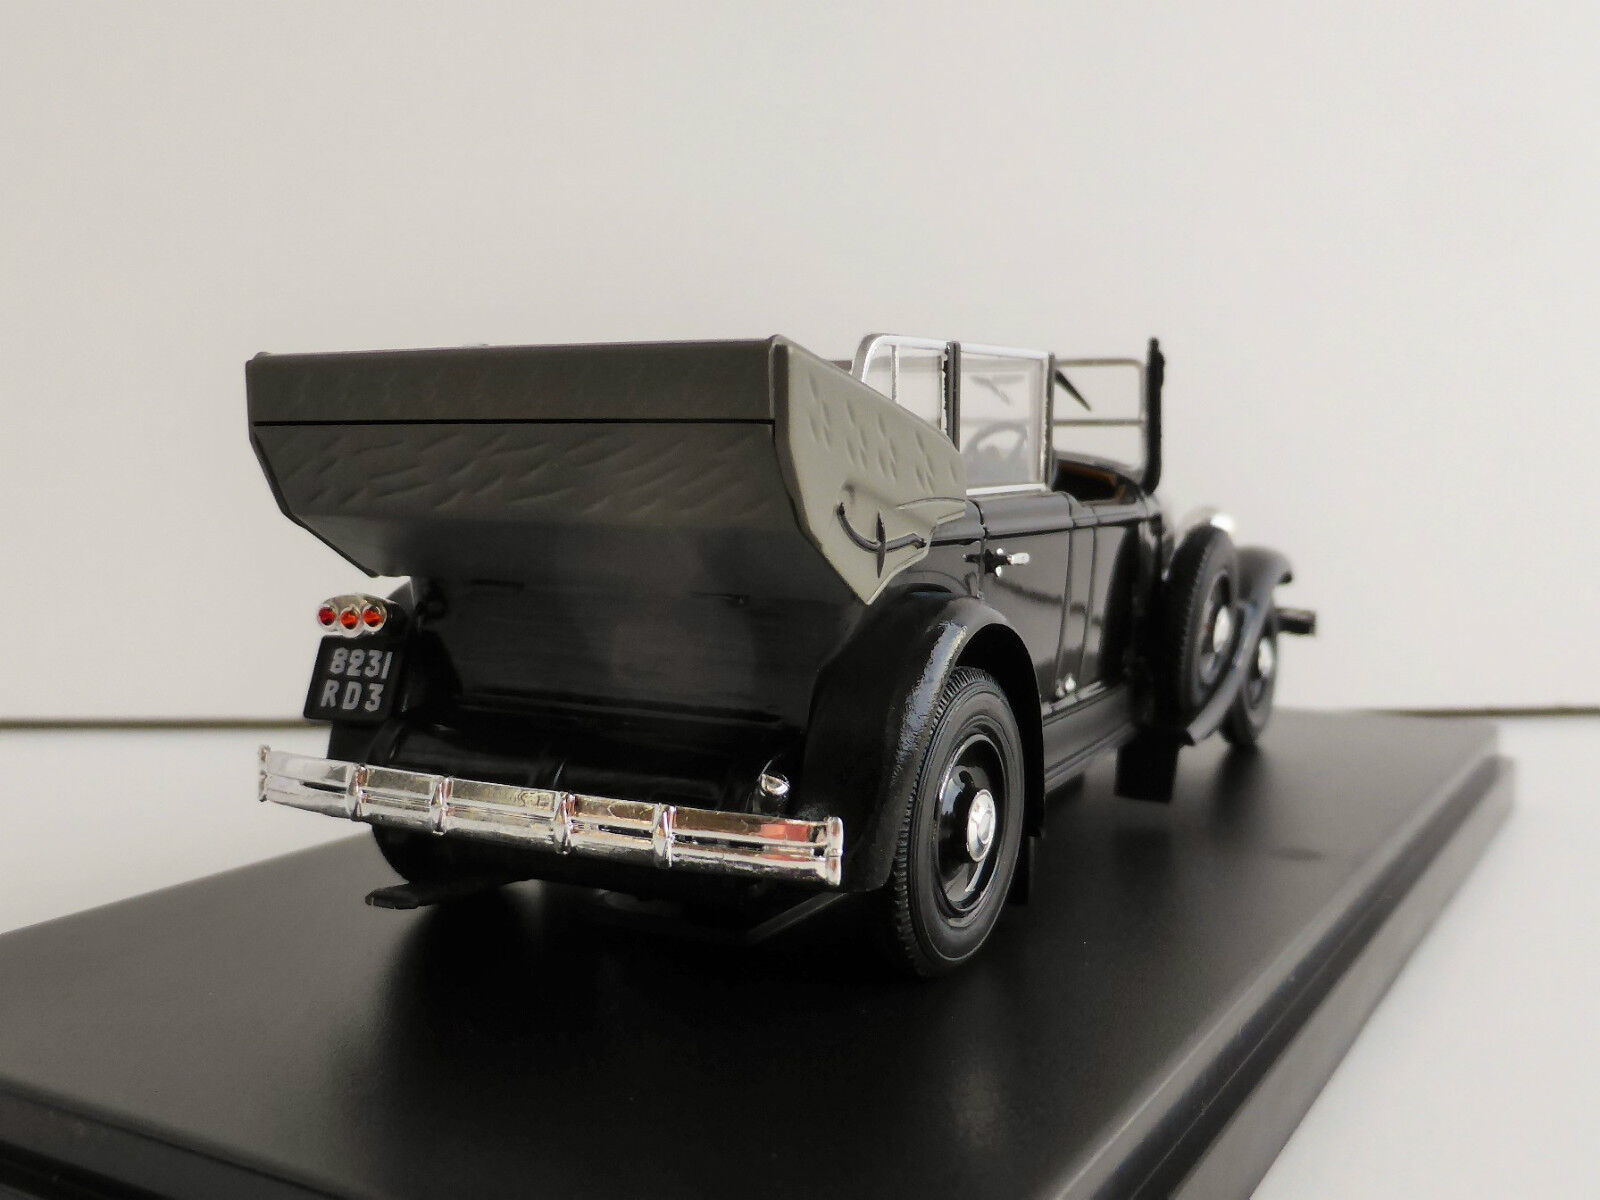 Renault Renault Renault REINASTELLA Presidentielle Albert Lebrun 1936 1 43 Norev 519549 Type RM 6cb7c2